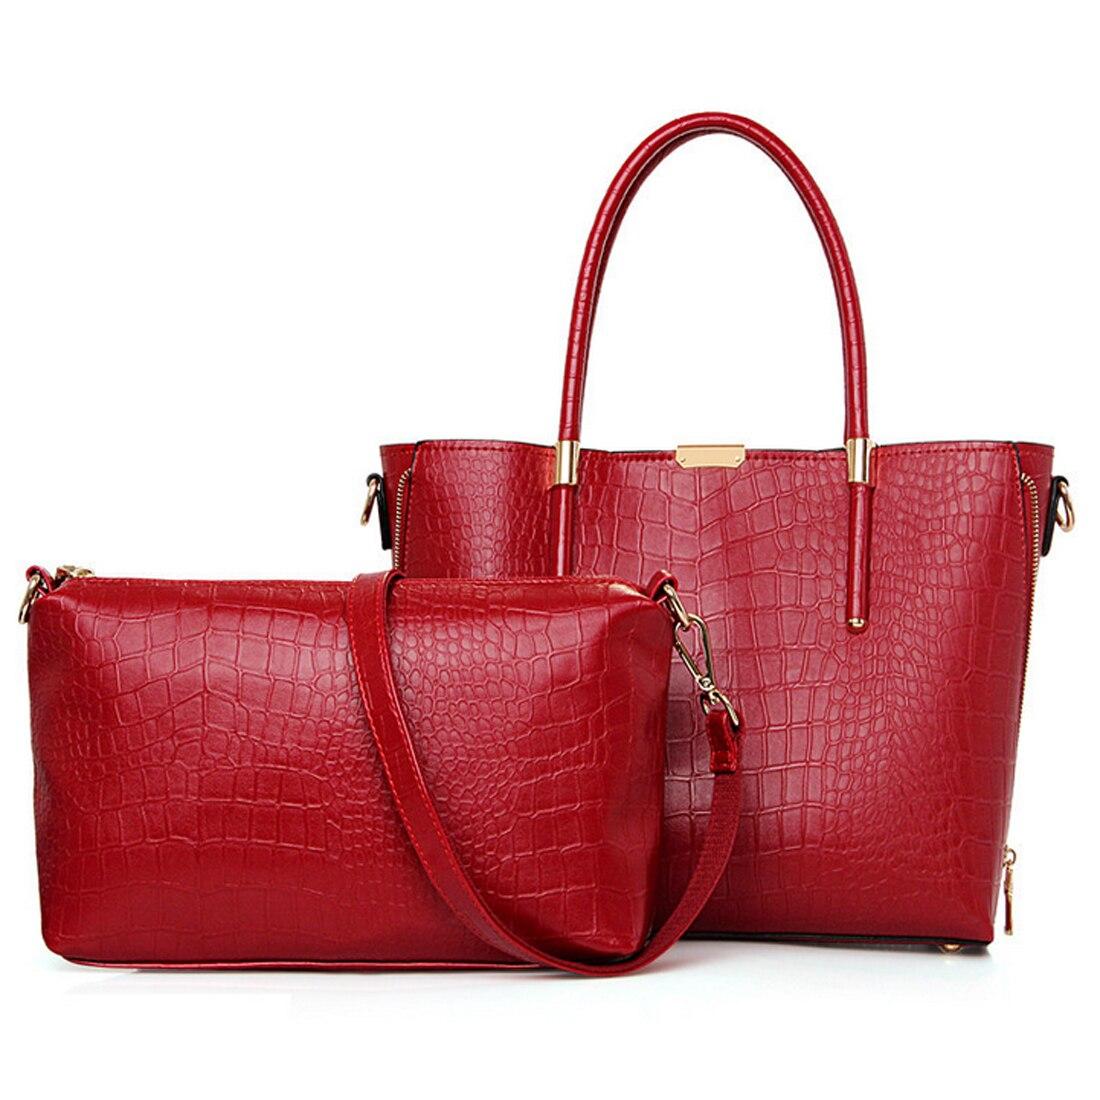 New Fashion Crocodile Women Shoulder Bags Gold Black Luxury Handbag PU Leather Female Large Tote Bag 2 Pcs handbags bolso